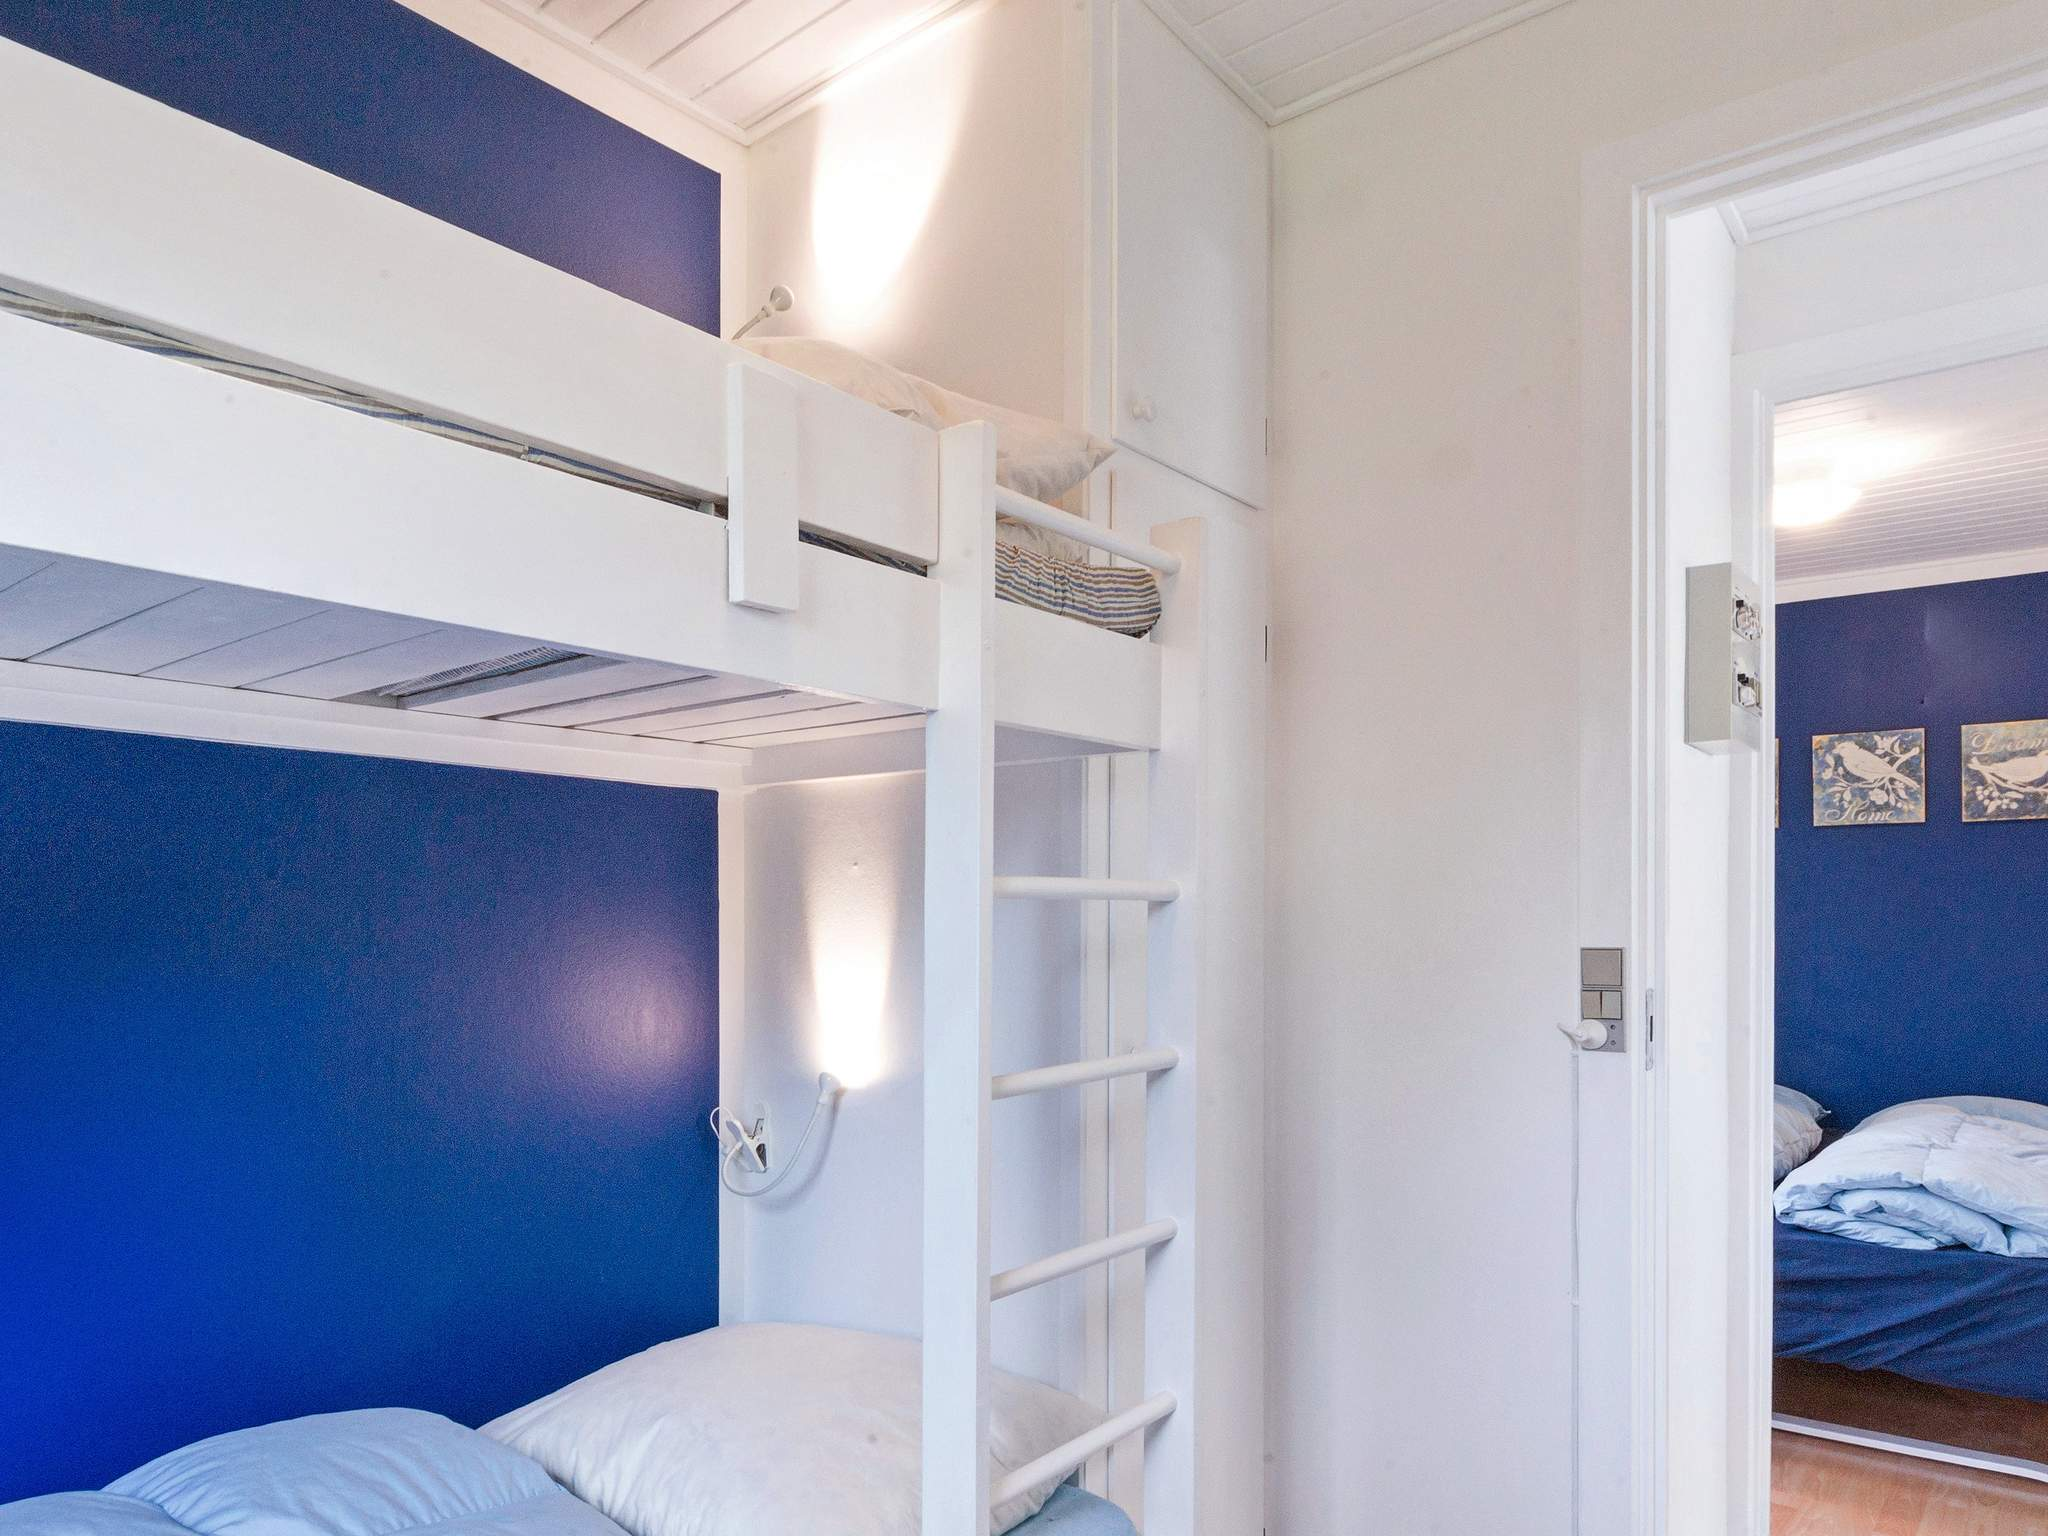 Ferienhaus Hasle (89205), Hasle, , Bornholm, Dänemark, Bild 10